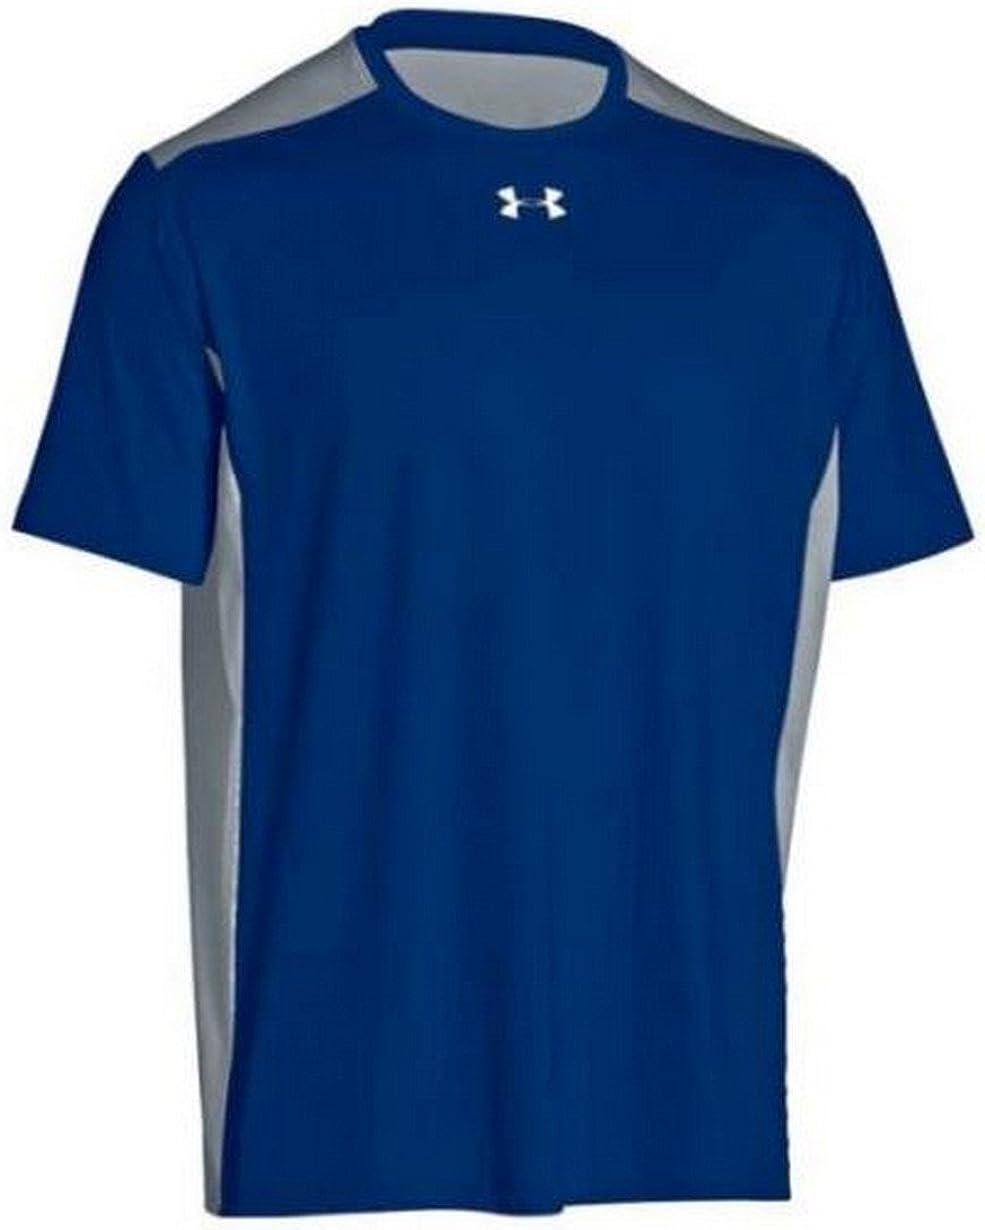 Under Armour Mens Short Sleeve Team Raid T-Shirt